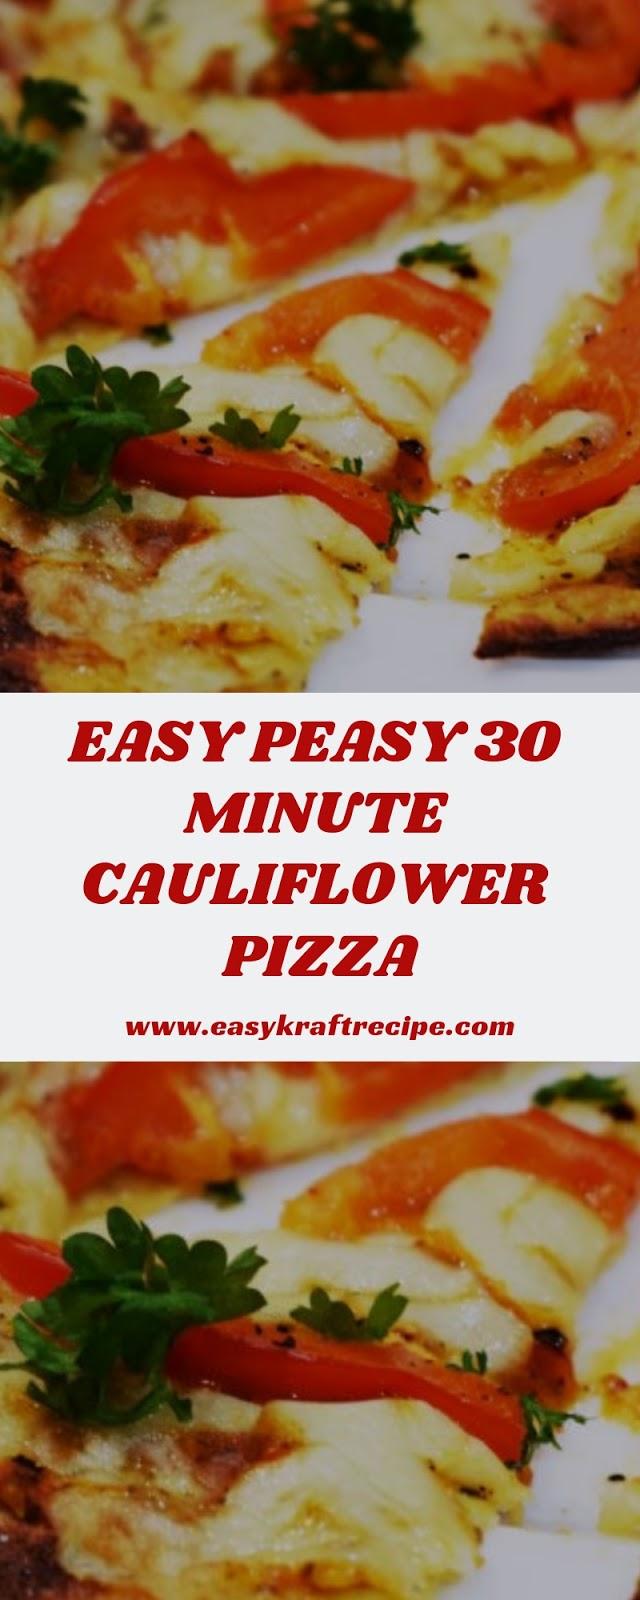 EASY PEASY 30 MINUTE CAULIFLOWER PIZZA